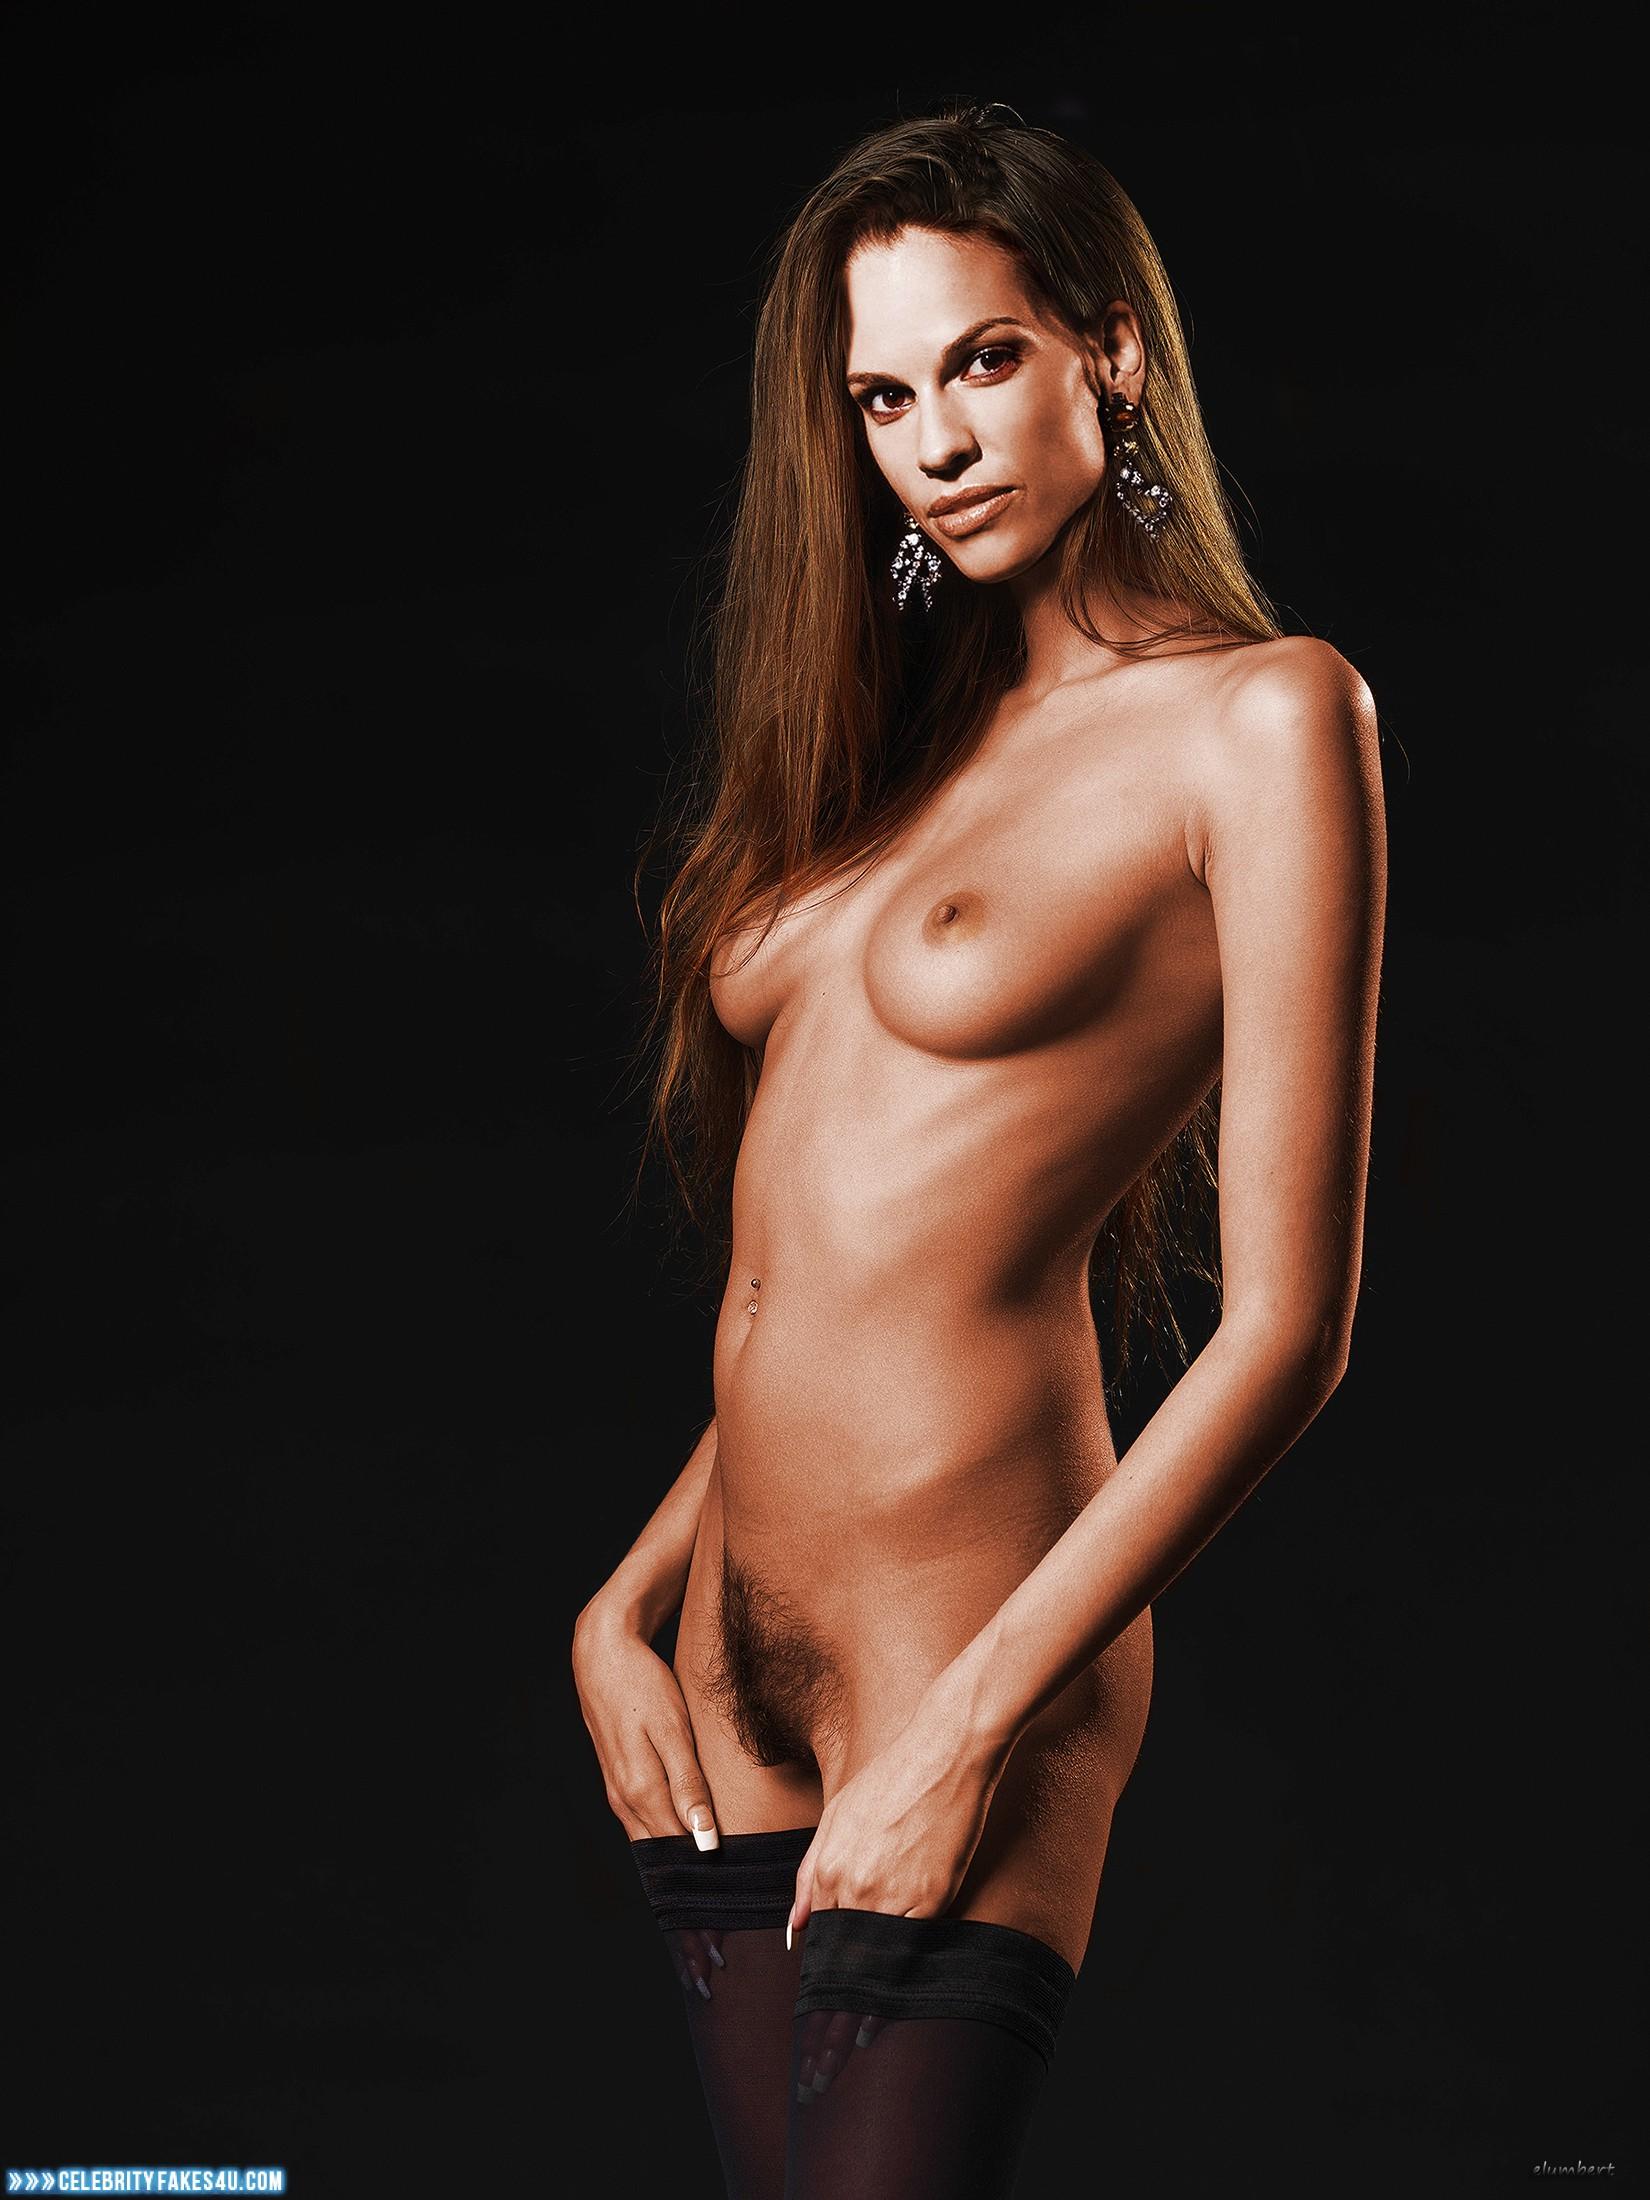 Hilary Swank Nude Photos